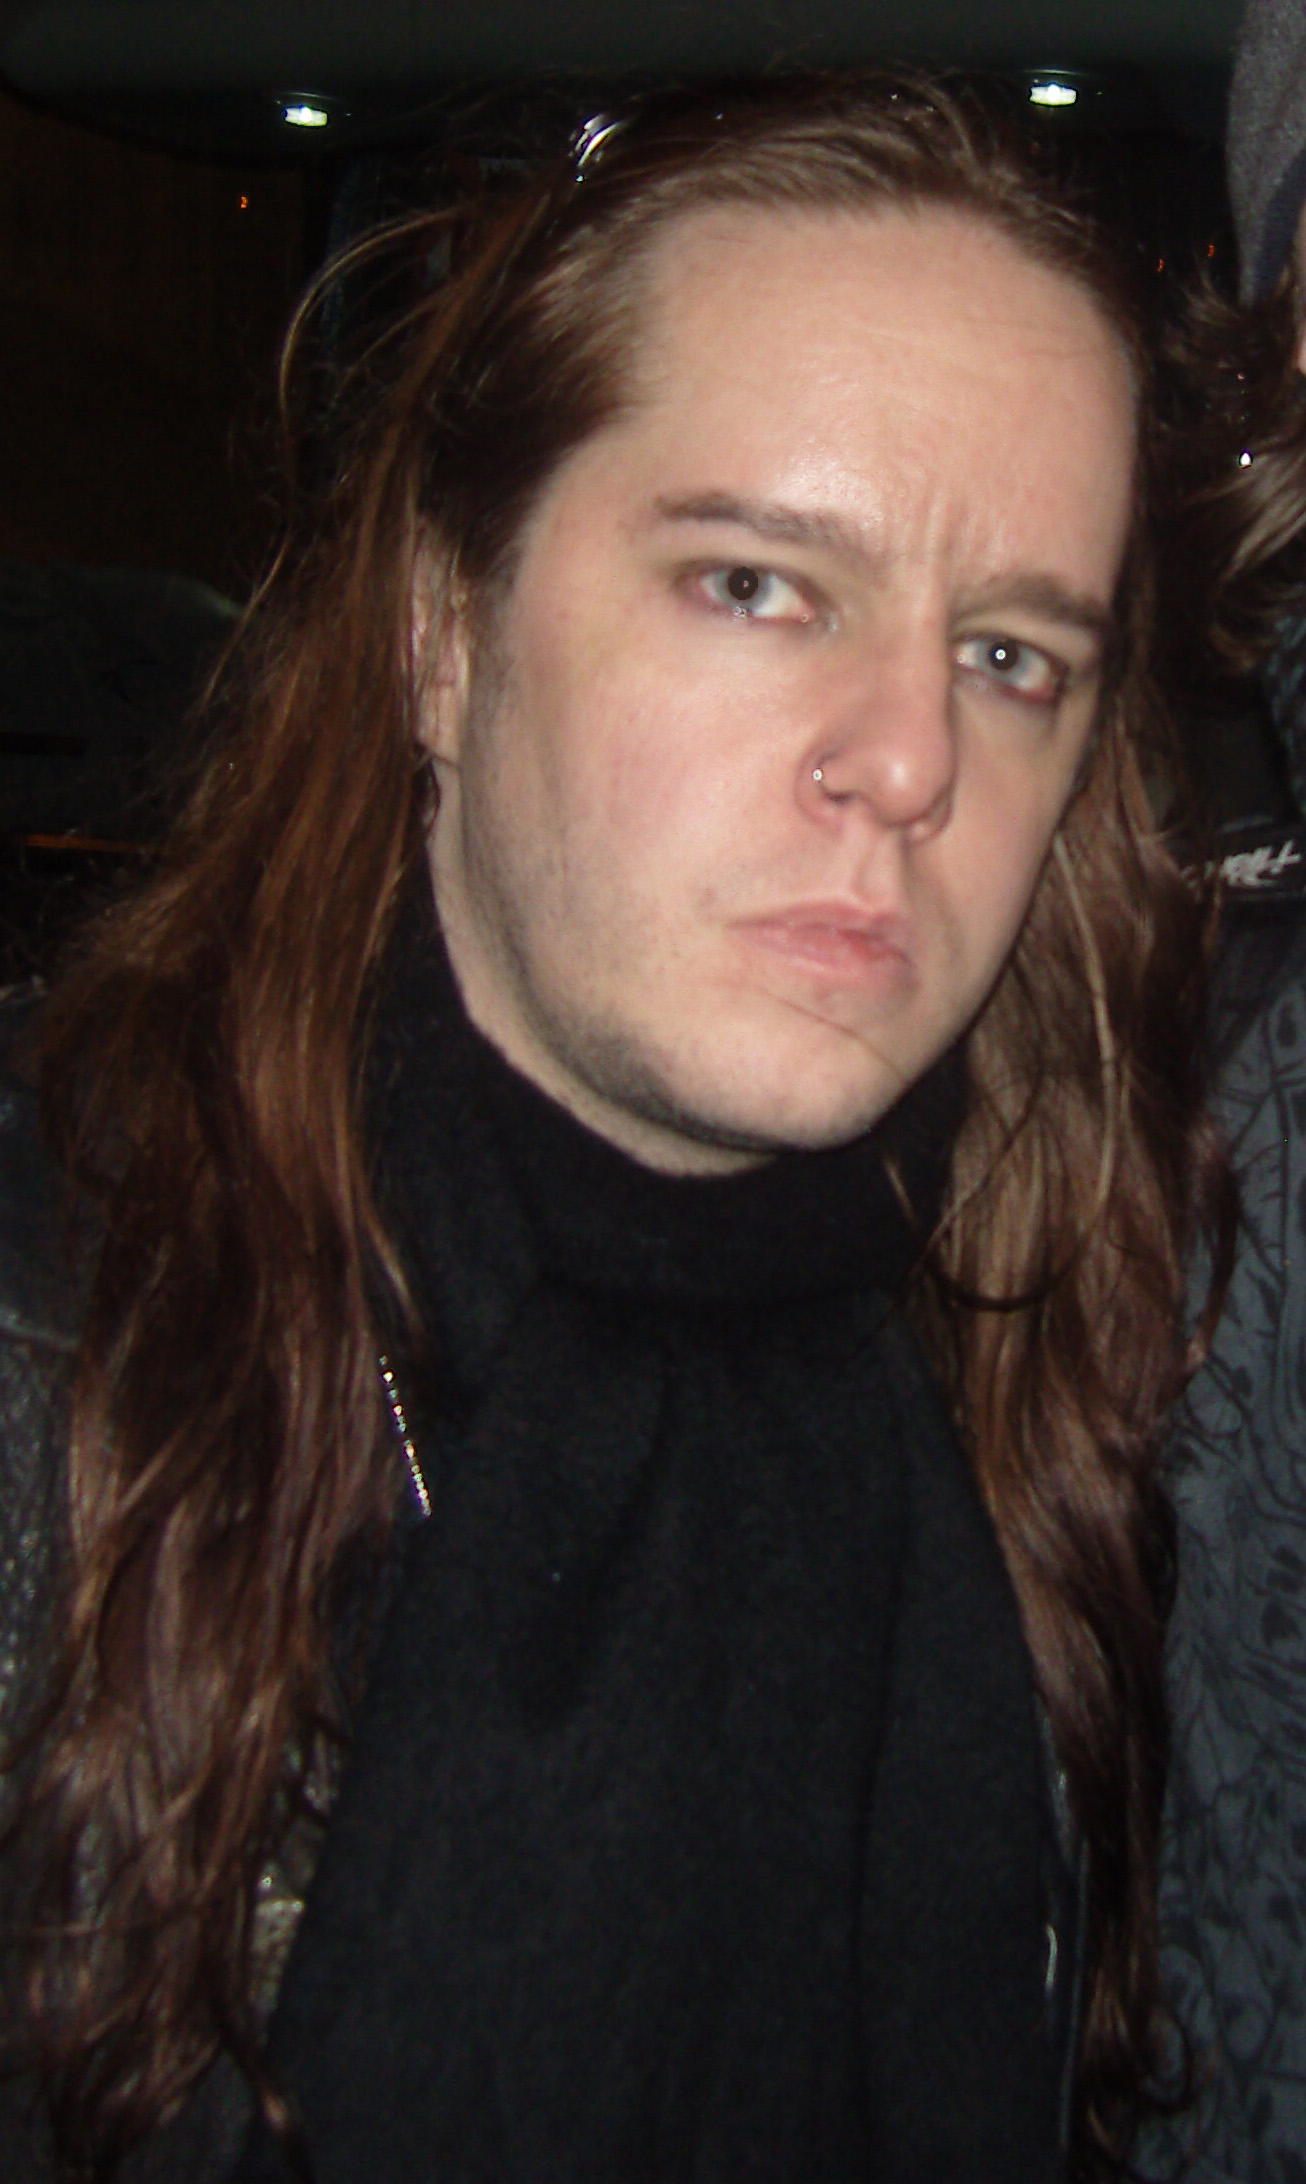 ... records artist vocalist guitarist musician joey jordison joey jordison